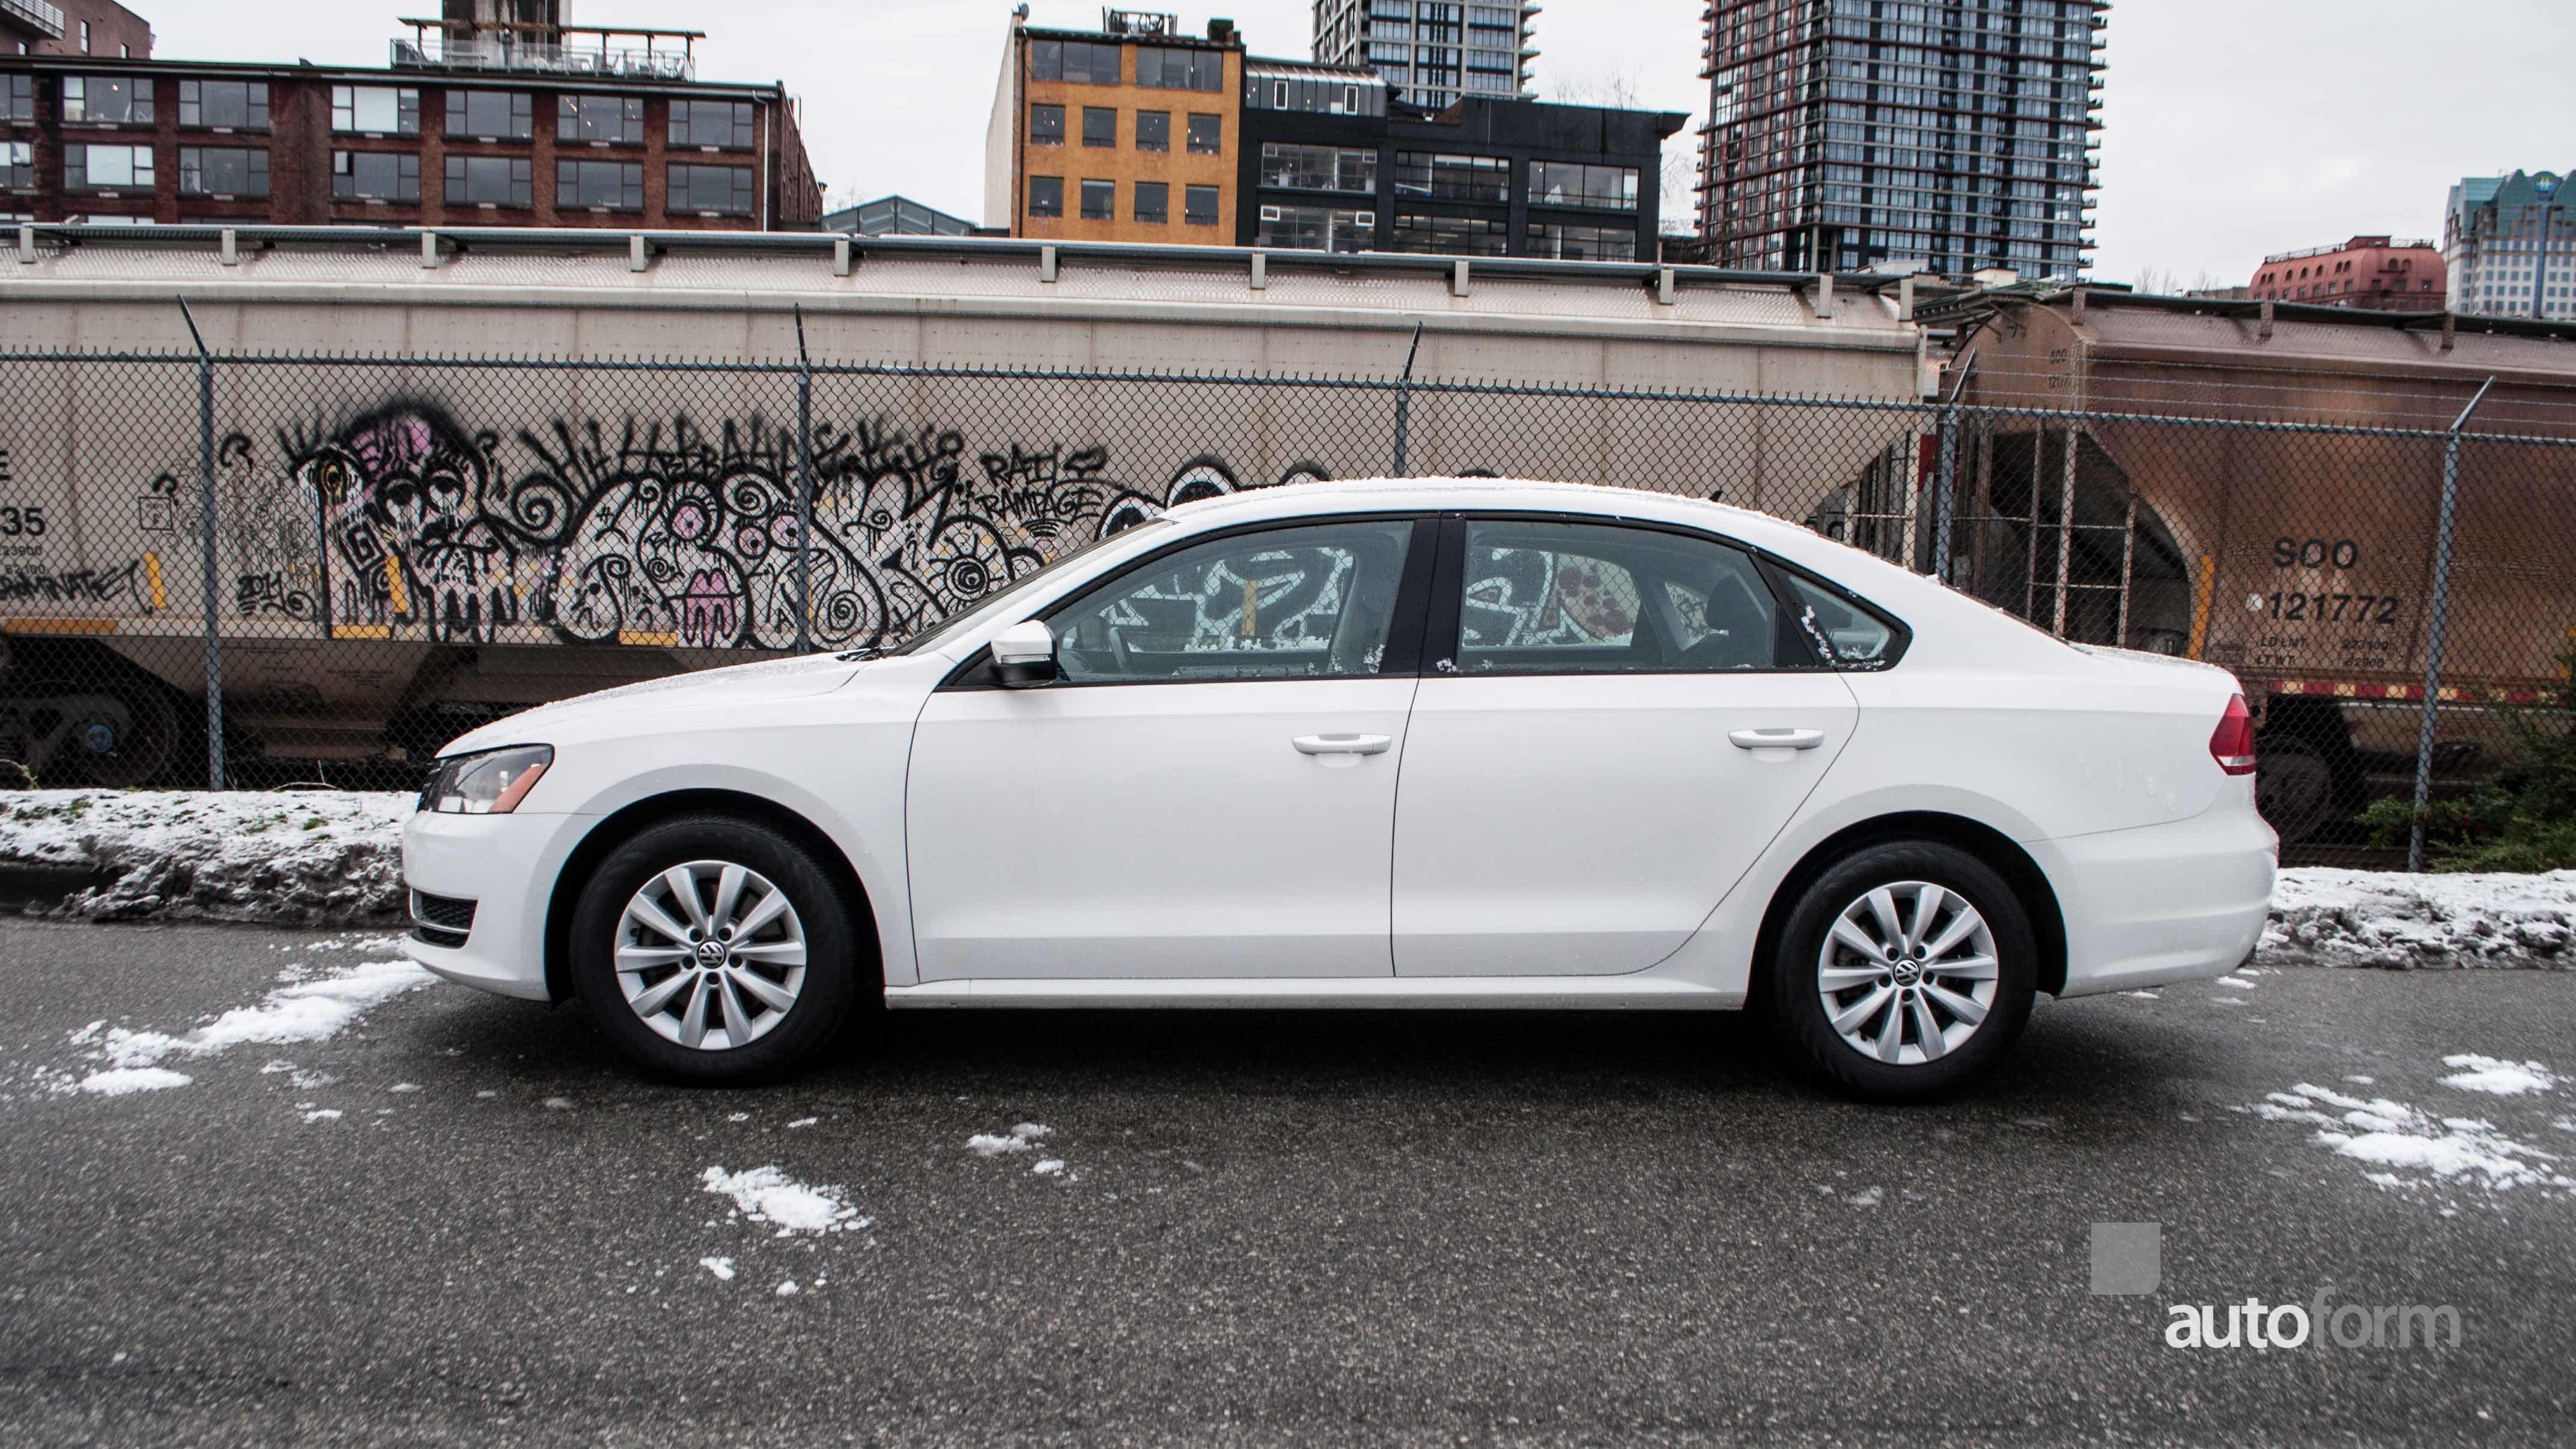 under for sale bloomington passat s original volkswagen htm peoria near il vw new hood tiguan the lease